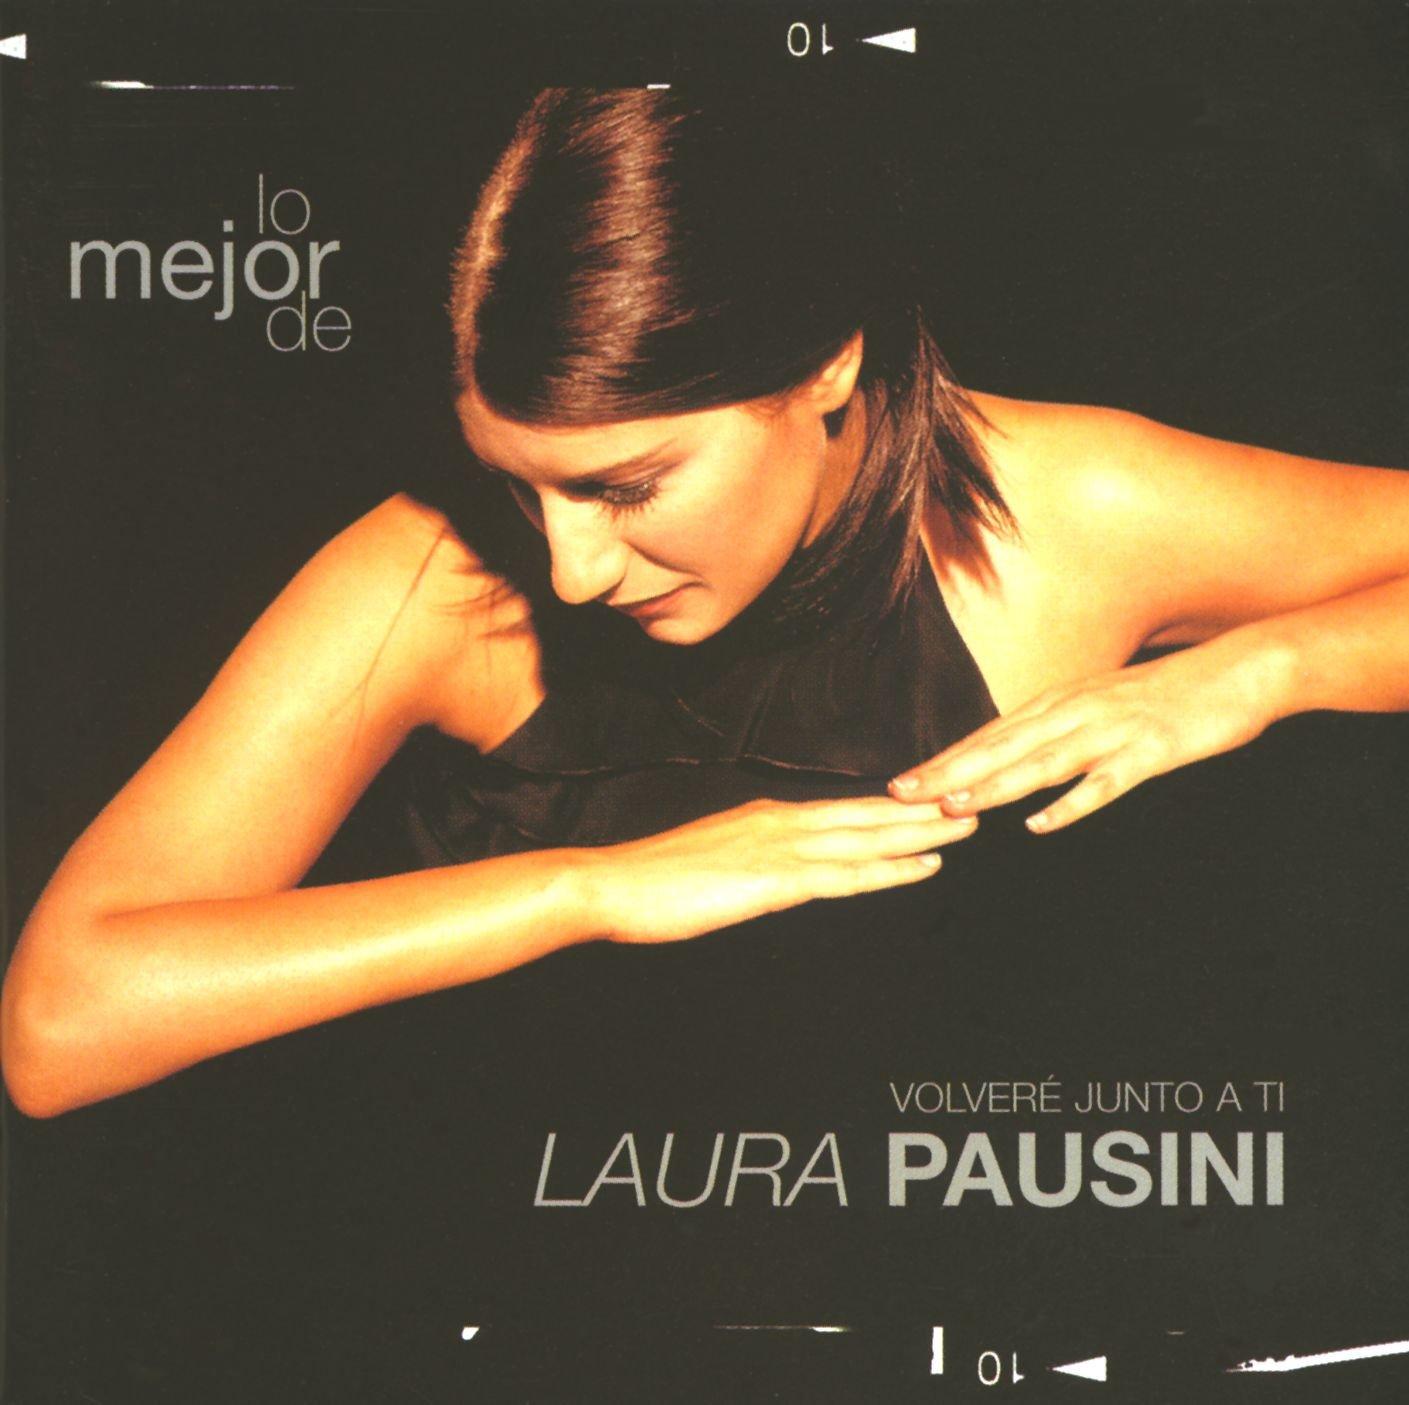 laura pausini english songs free download